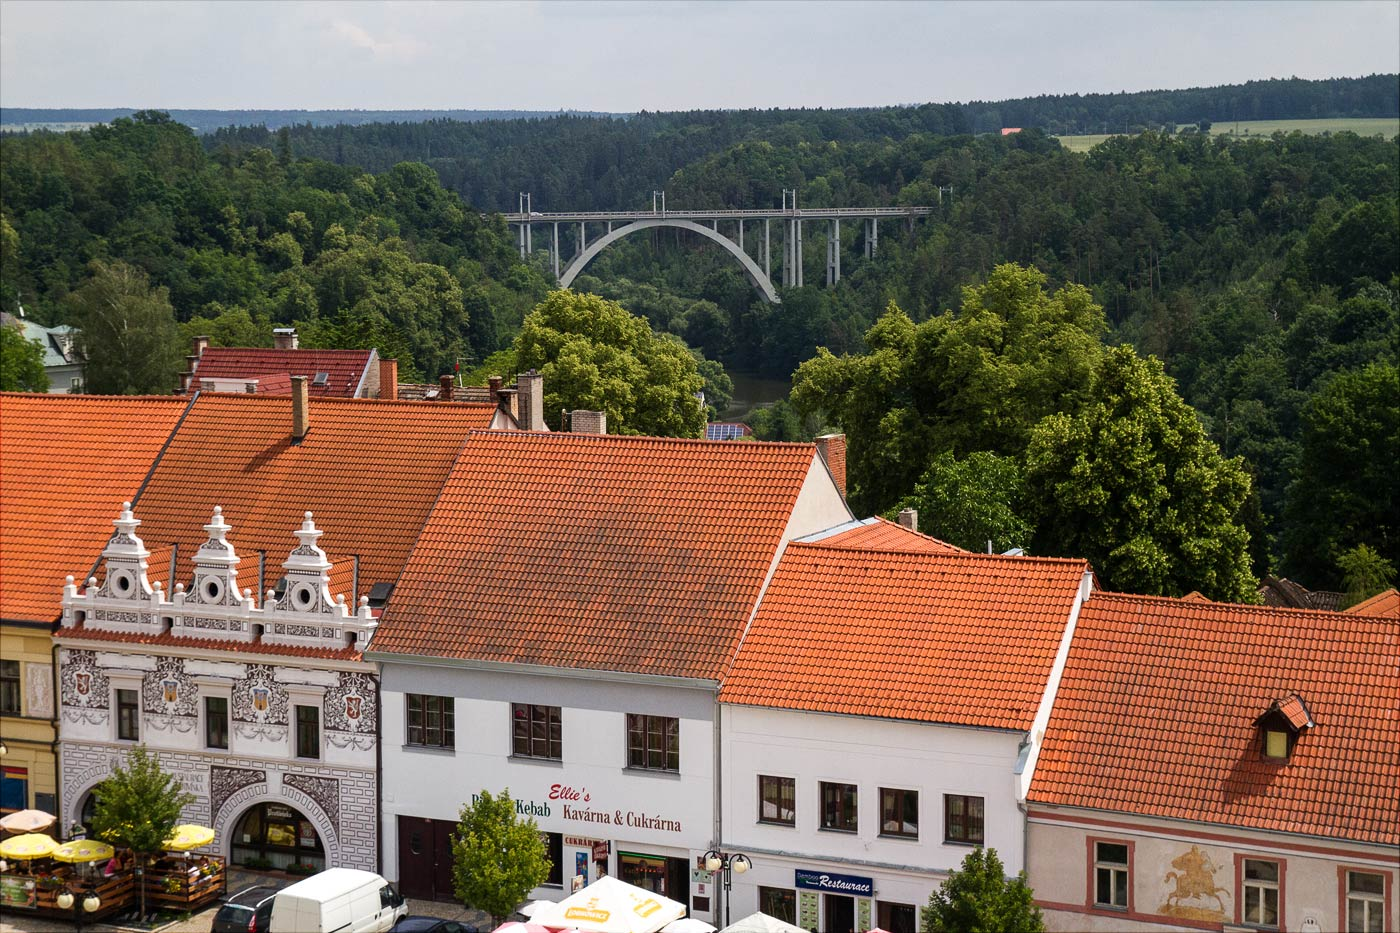 Бехине, вид на арочный мост над рекой Лужнице